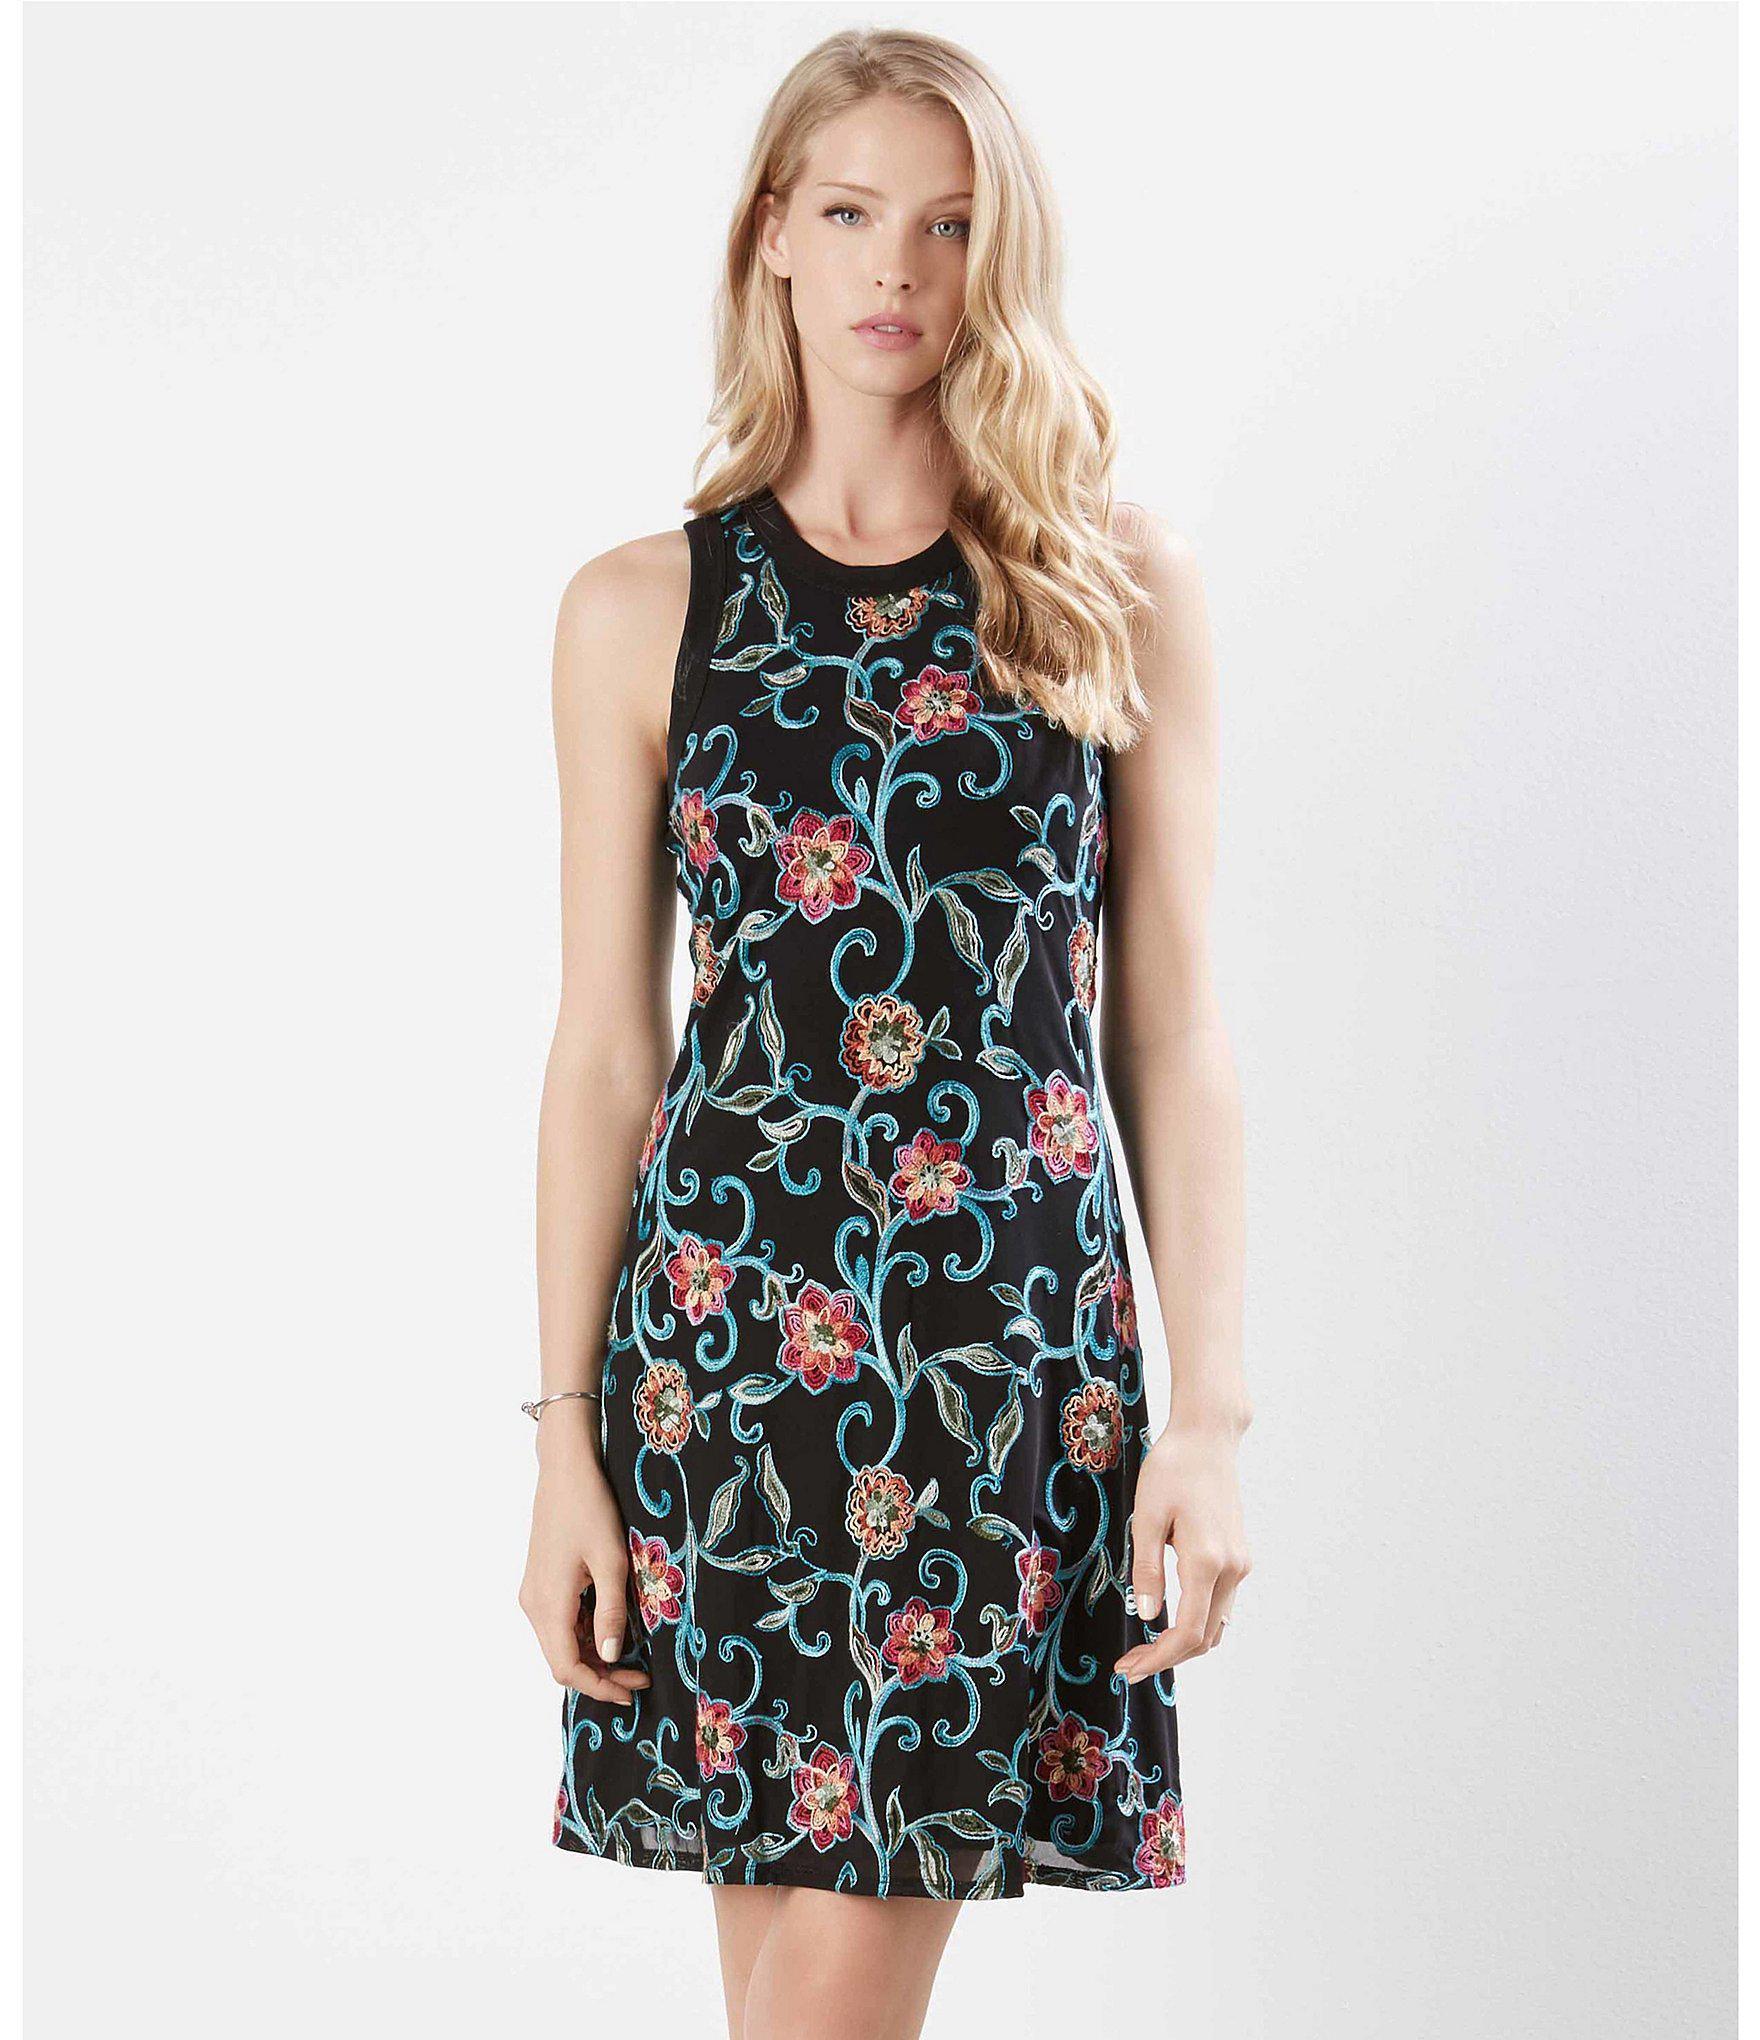 a633de21a34 Lyst - Karen Kane Embroidered Mesh Halter Dress in Black